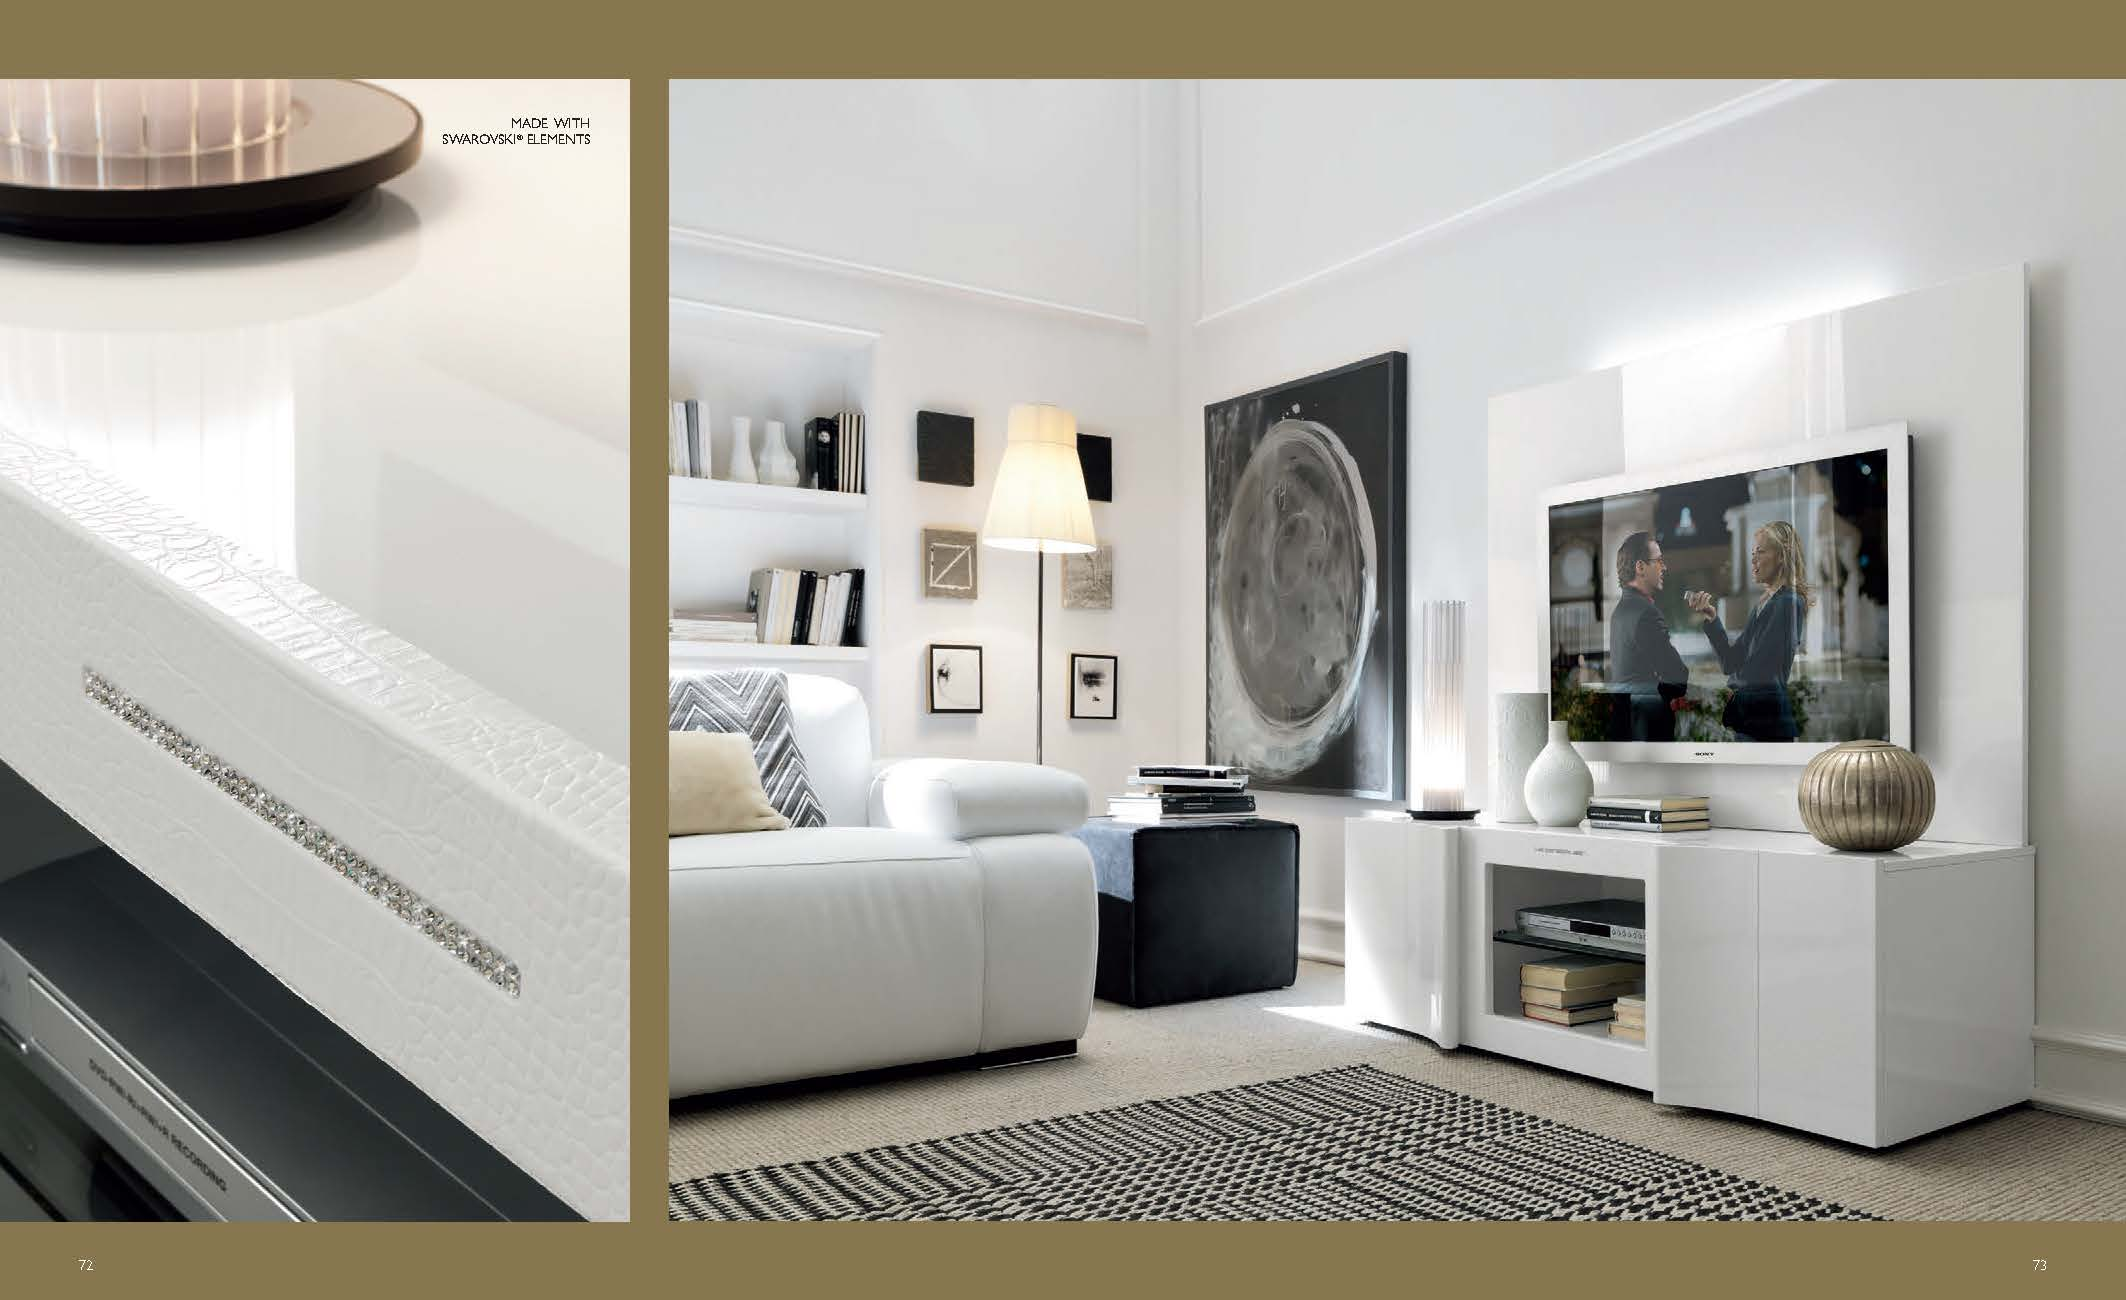 armonia tv wall unit, sma modern wall units living room, italy